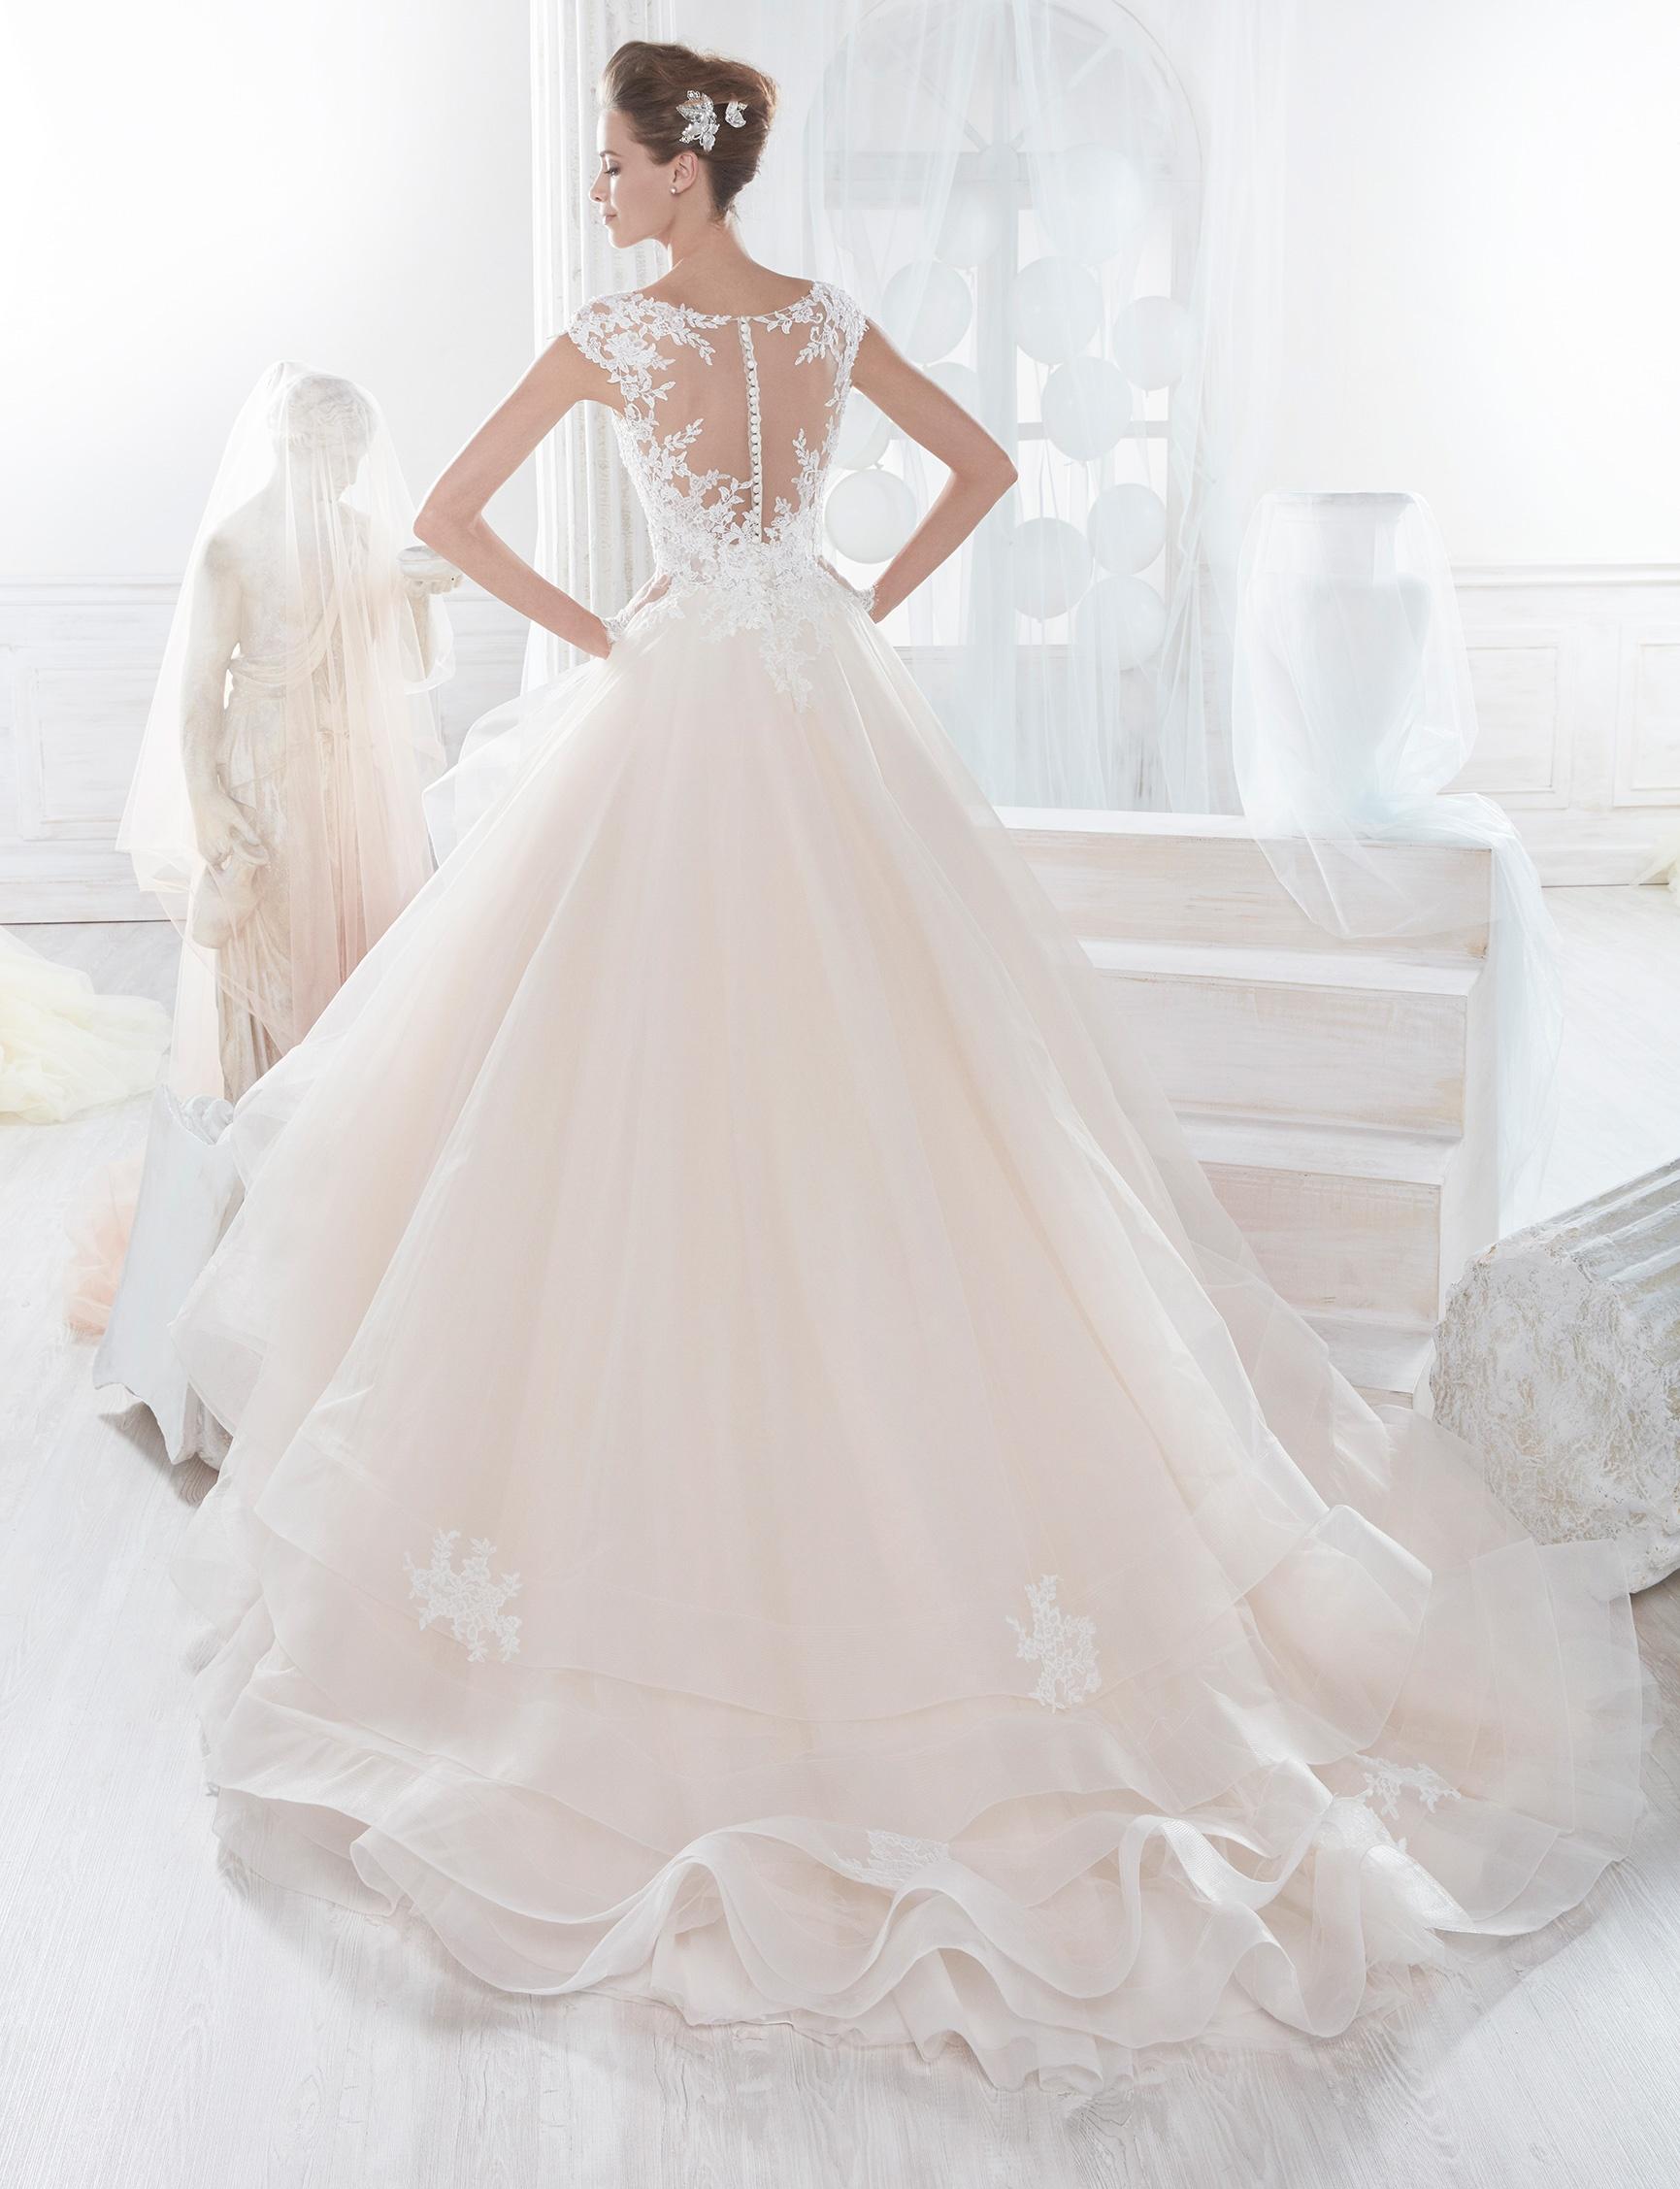 NIAB18062 esküvői ruha - NICOLE SPOSE Milano kollekció